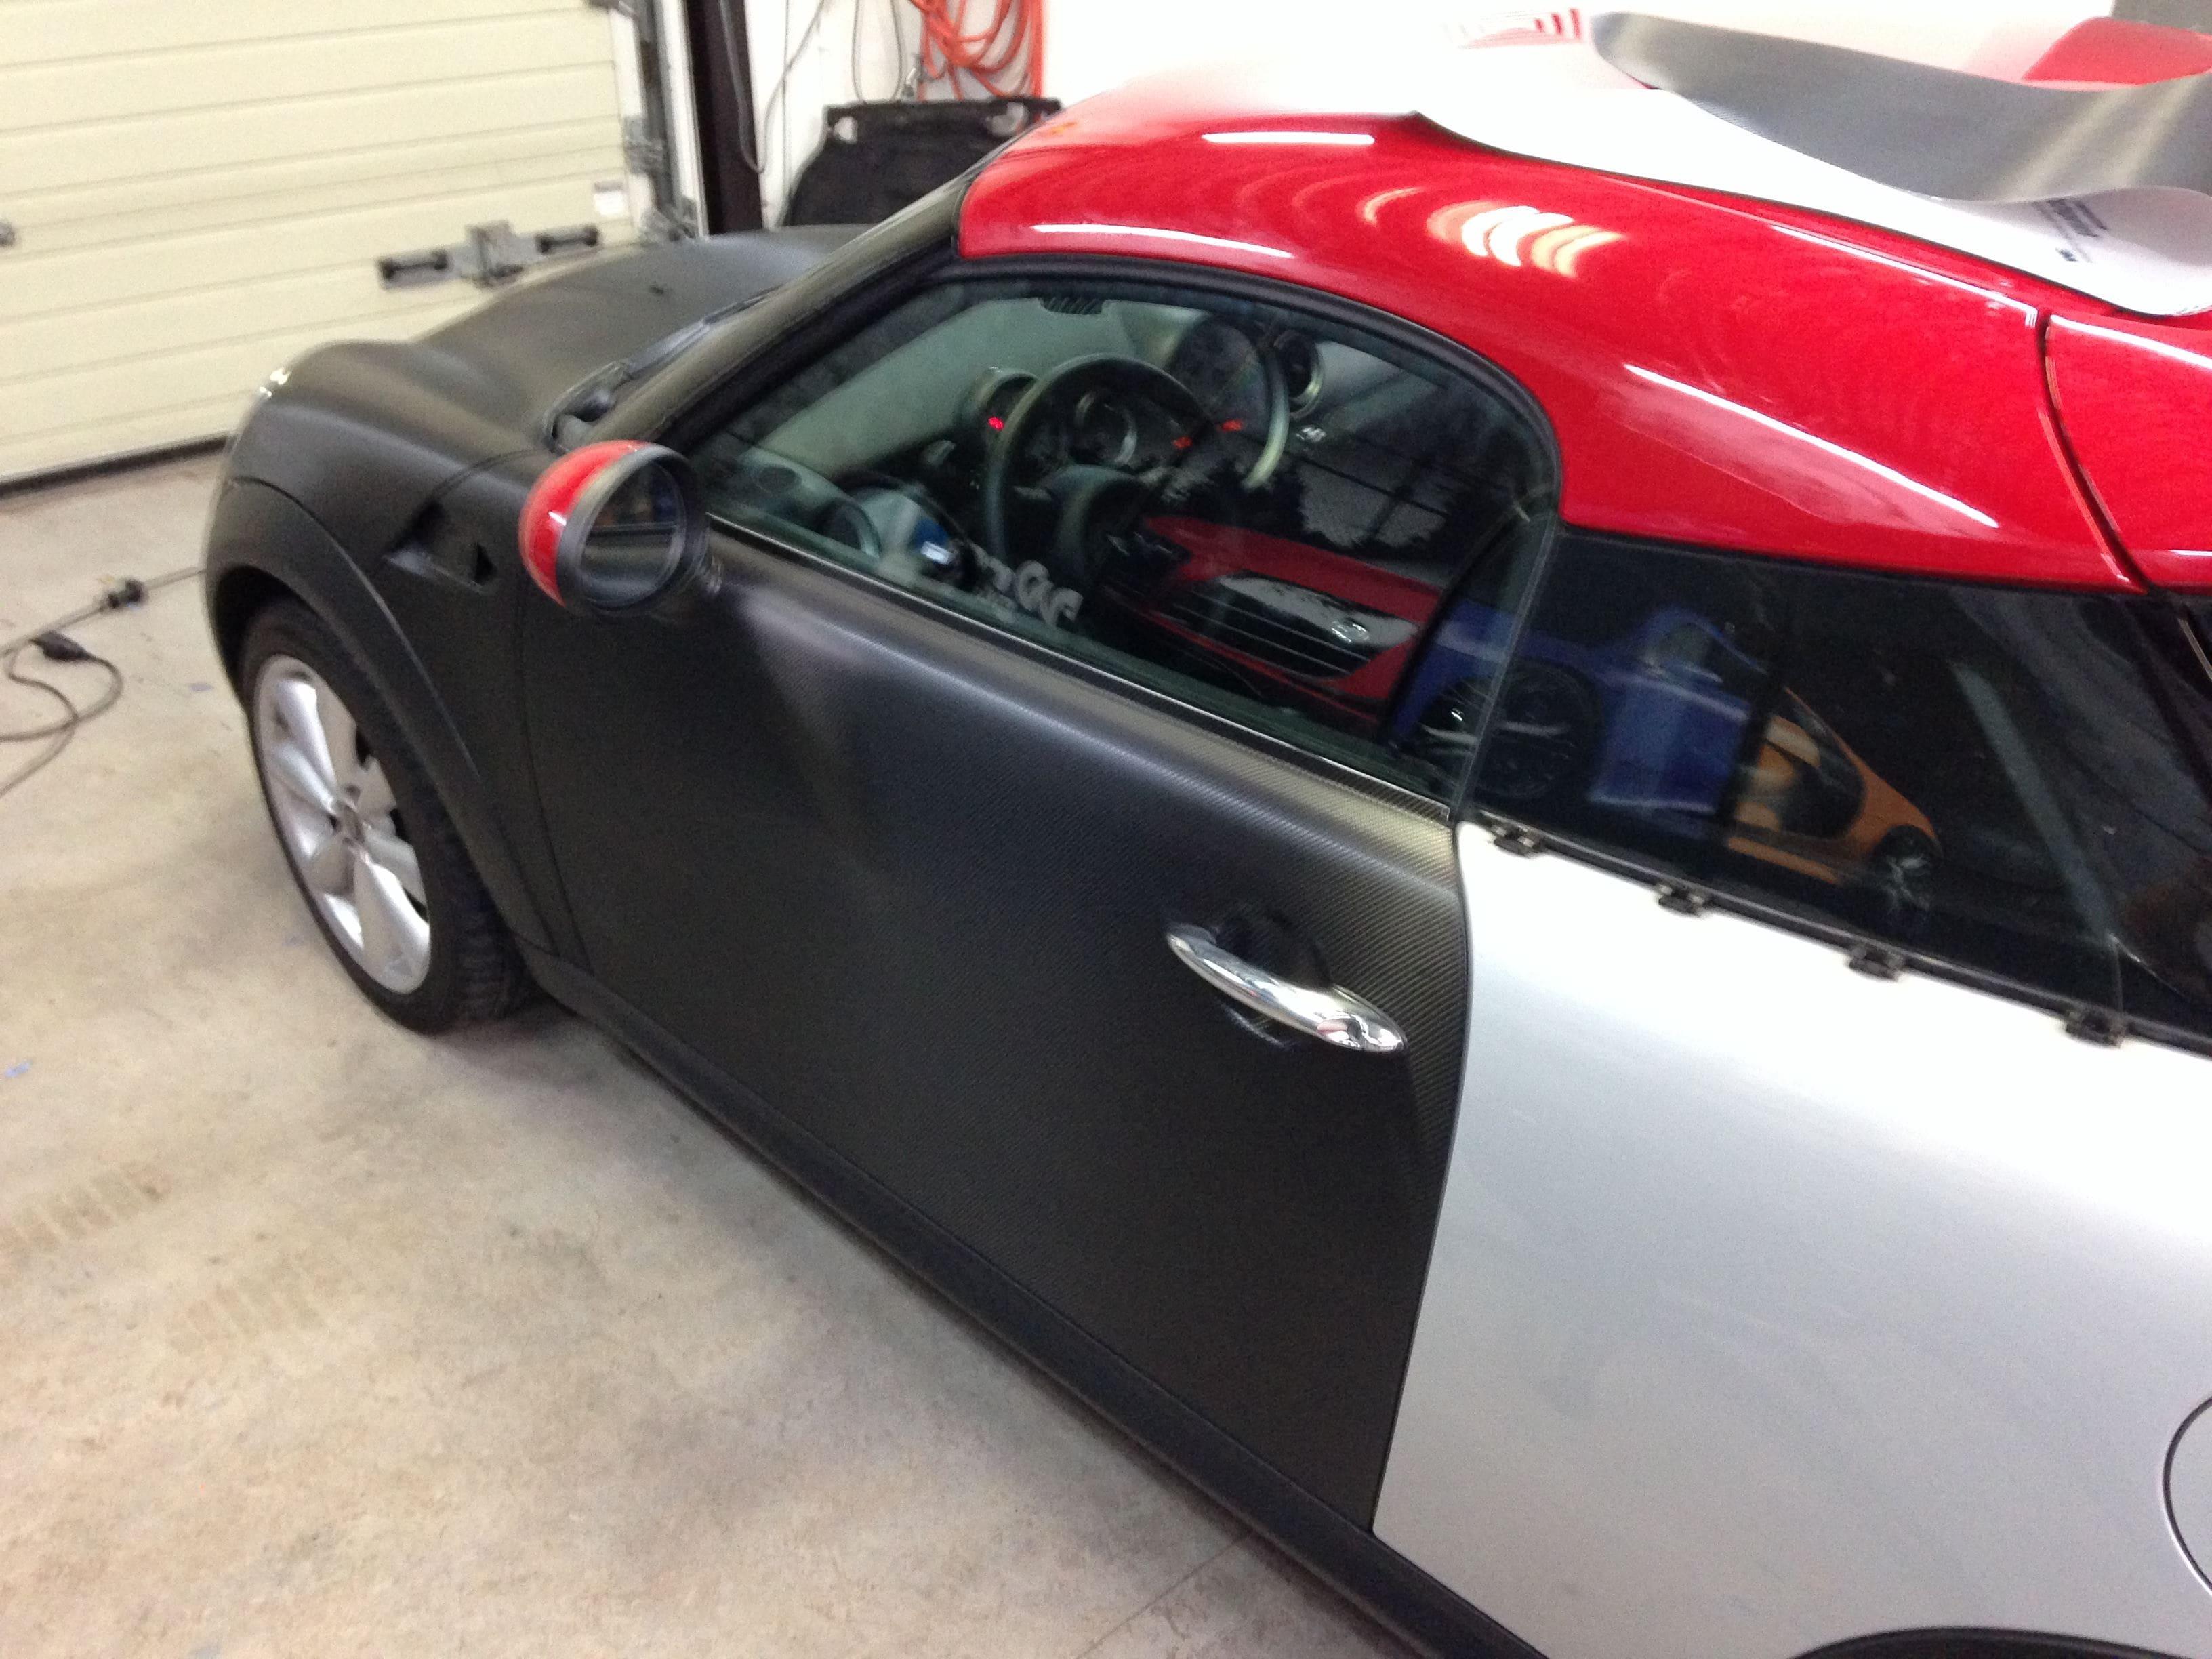 Mini Cooper Coupe in Carbon Wrap met Rode accenten, Carwrapping door Wrapmyride.nu Foto-nr:6389, ©2021